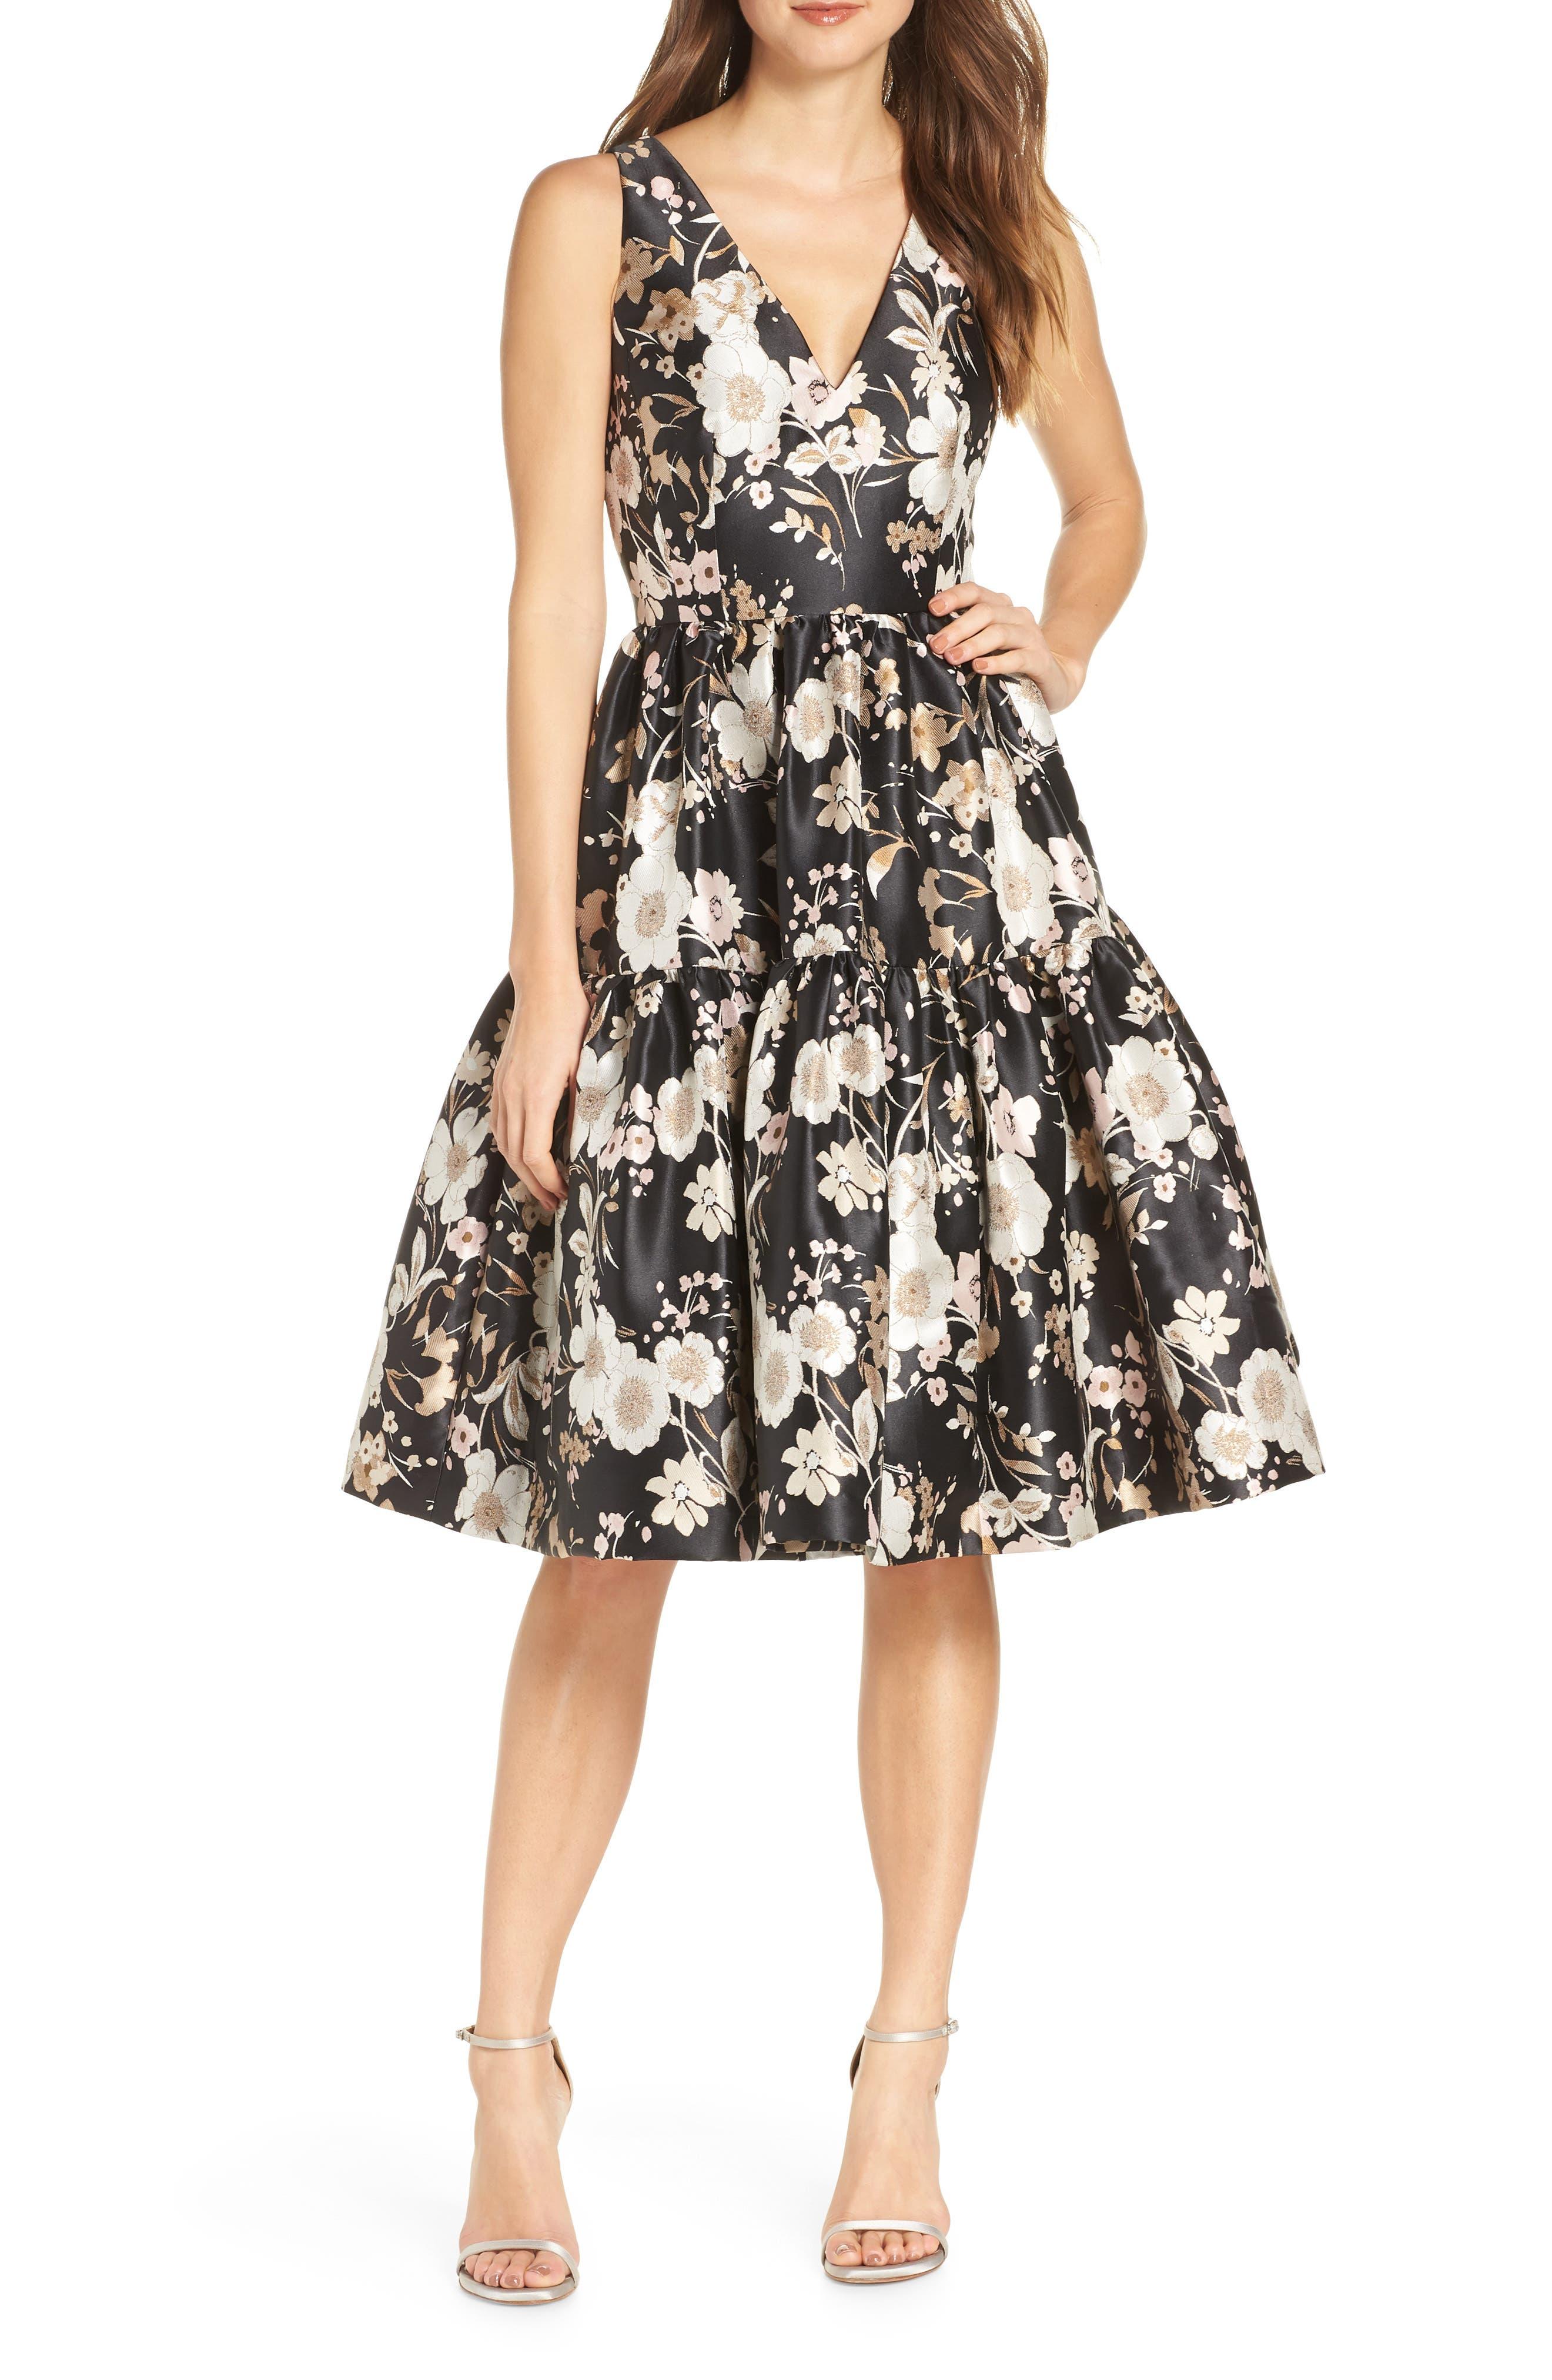 ELIZA J Floral Jacquard Fit & Flare Dress, Main, color, BLACK WHITE